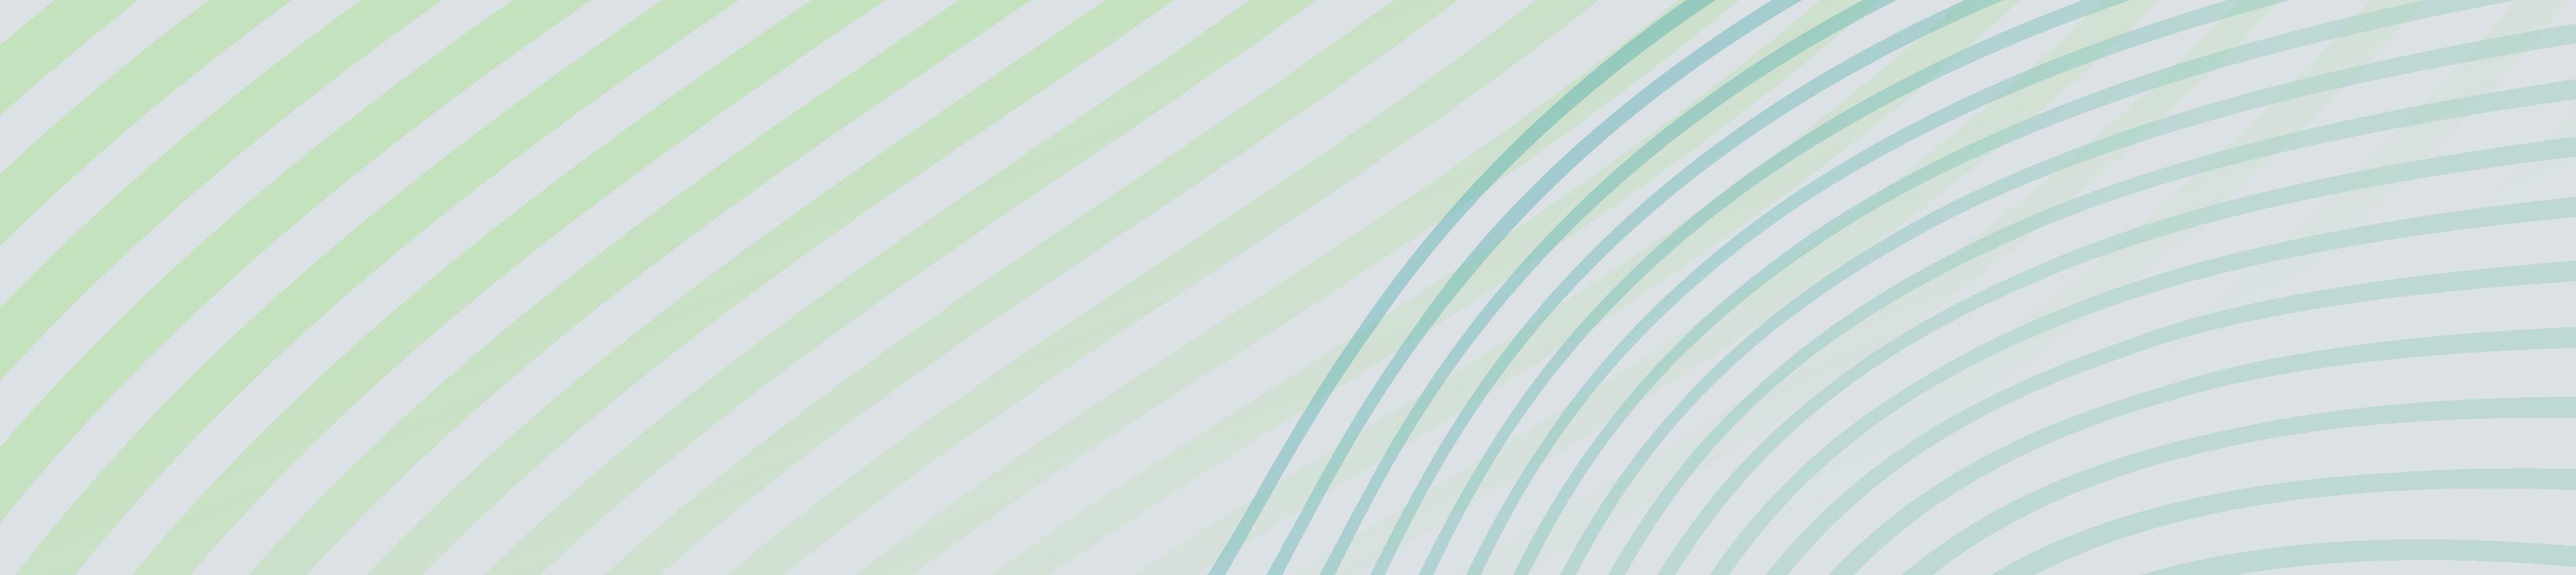 NúcleodeForma – Psi com Cri1800x4023